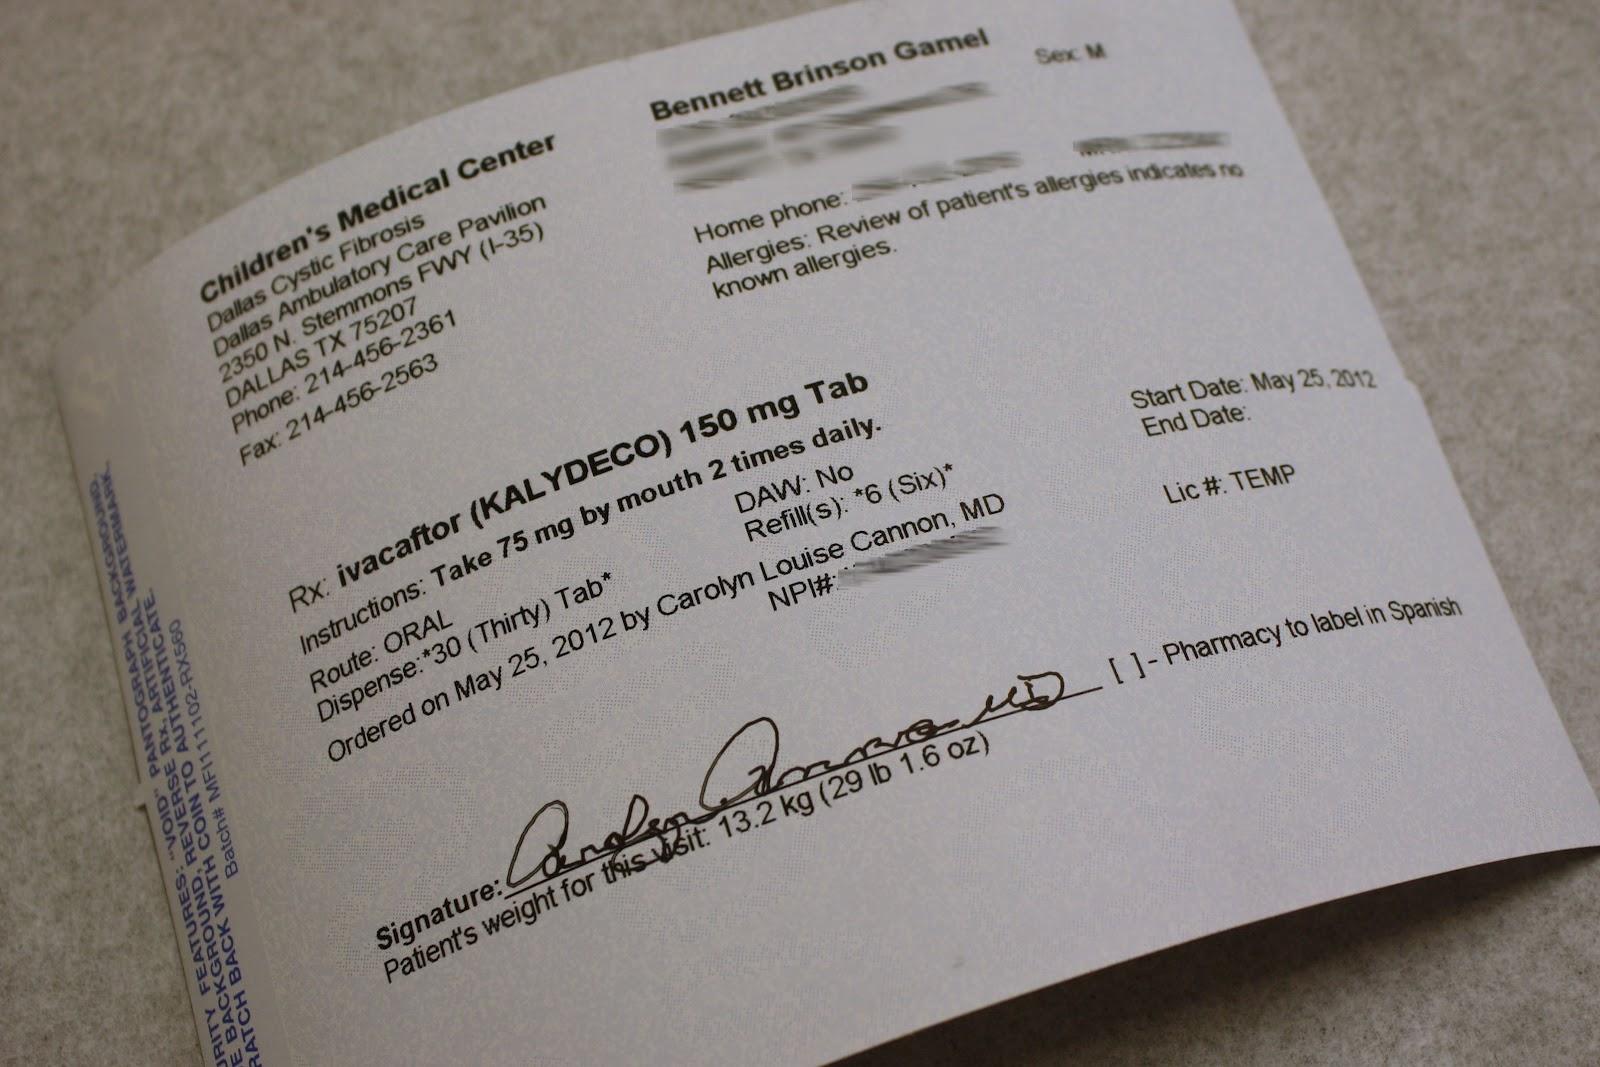 Bennett Brinson Gamel Fighting Cystic Fibrosis A Prized Script